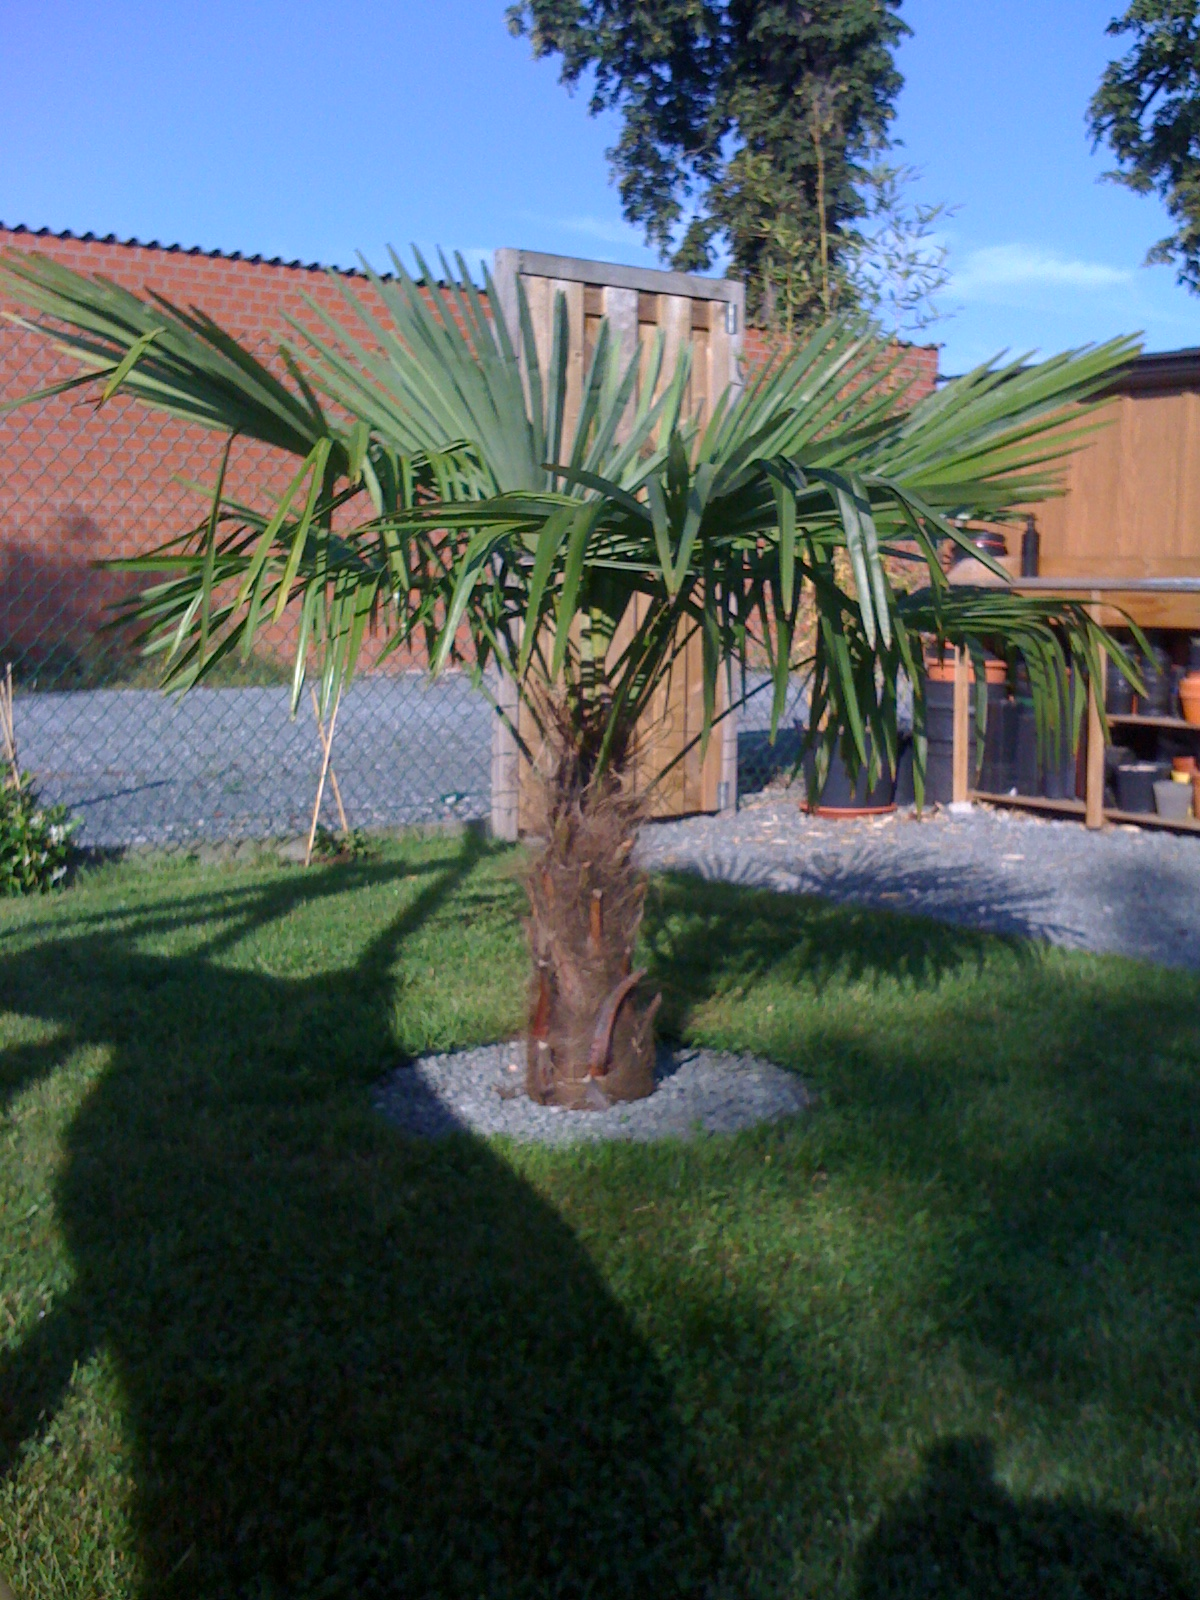 la collection de palmiers de la palmeraie la palmeraie fr